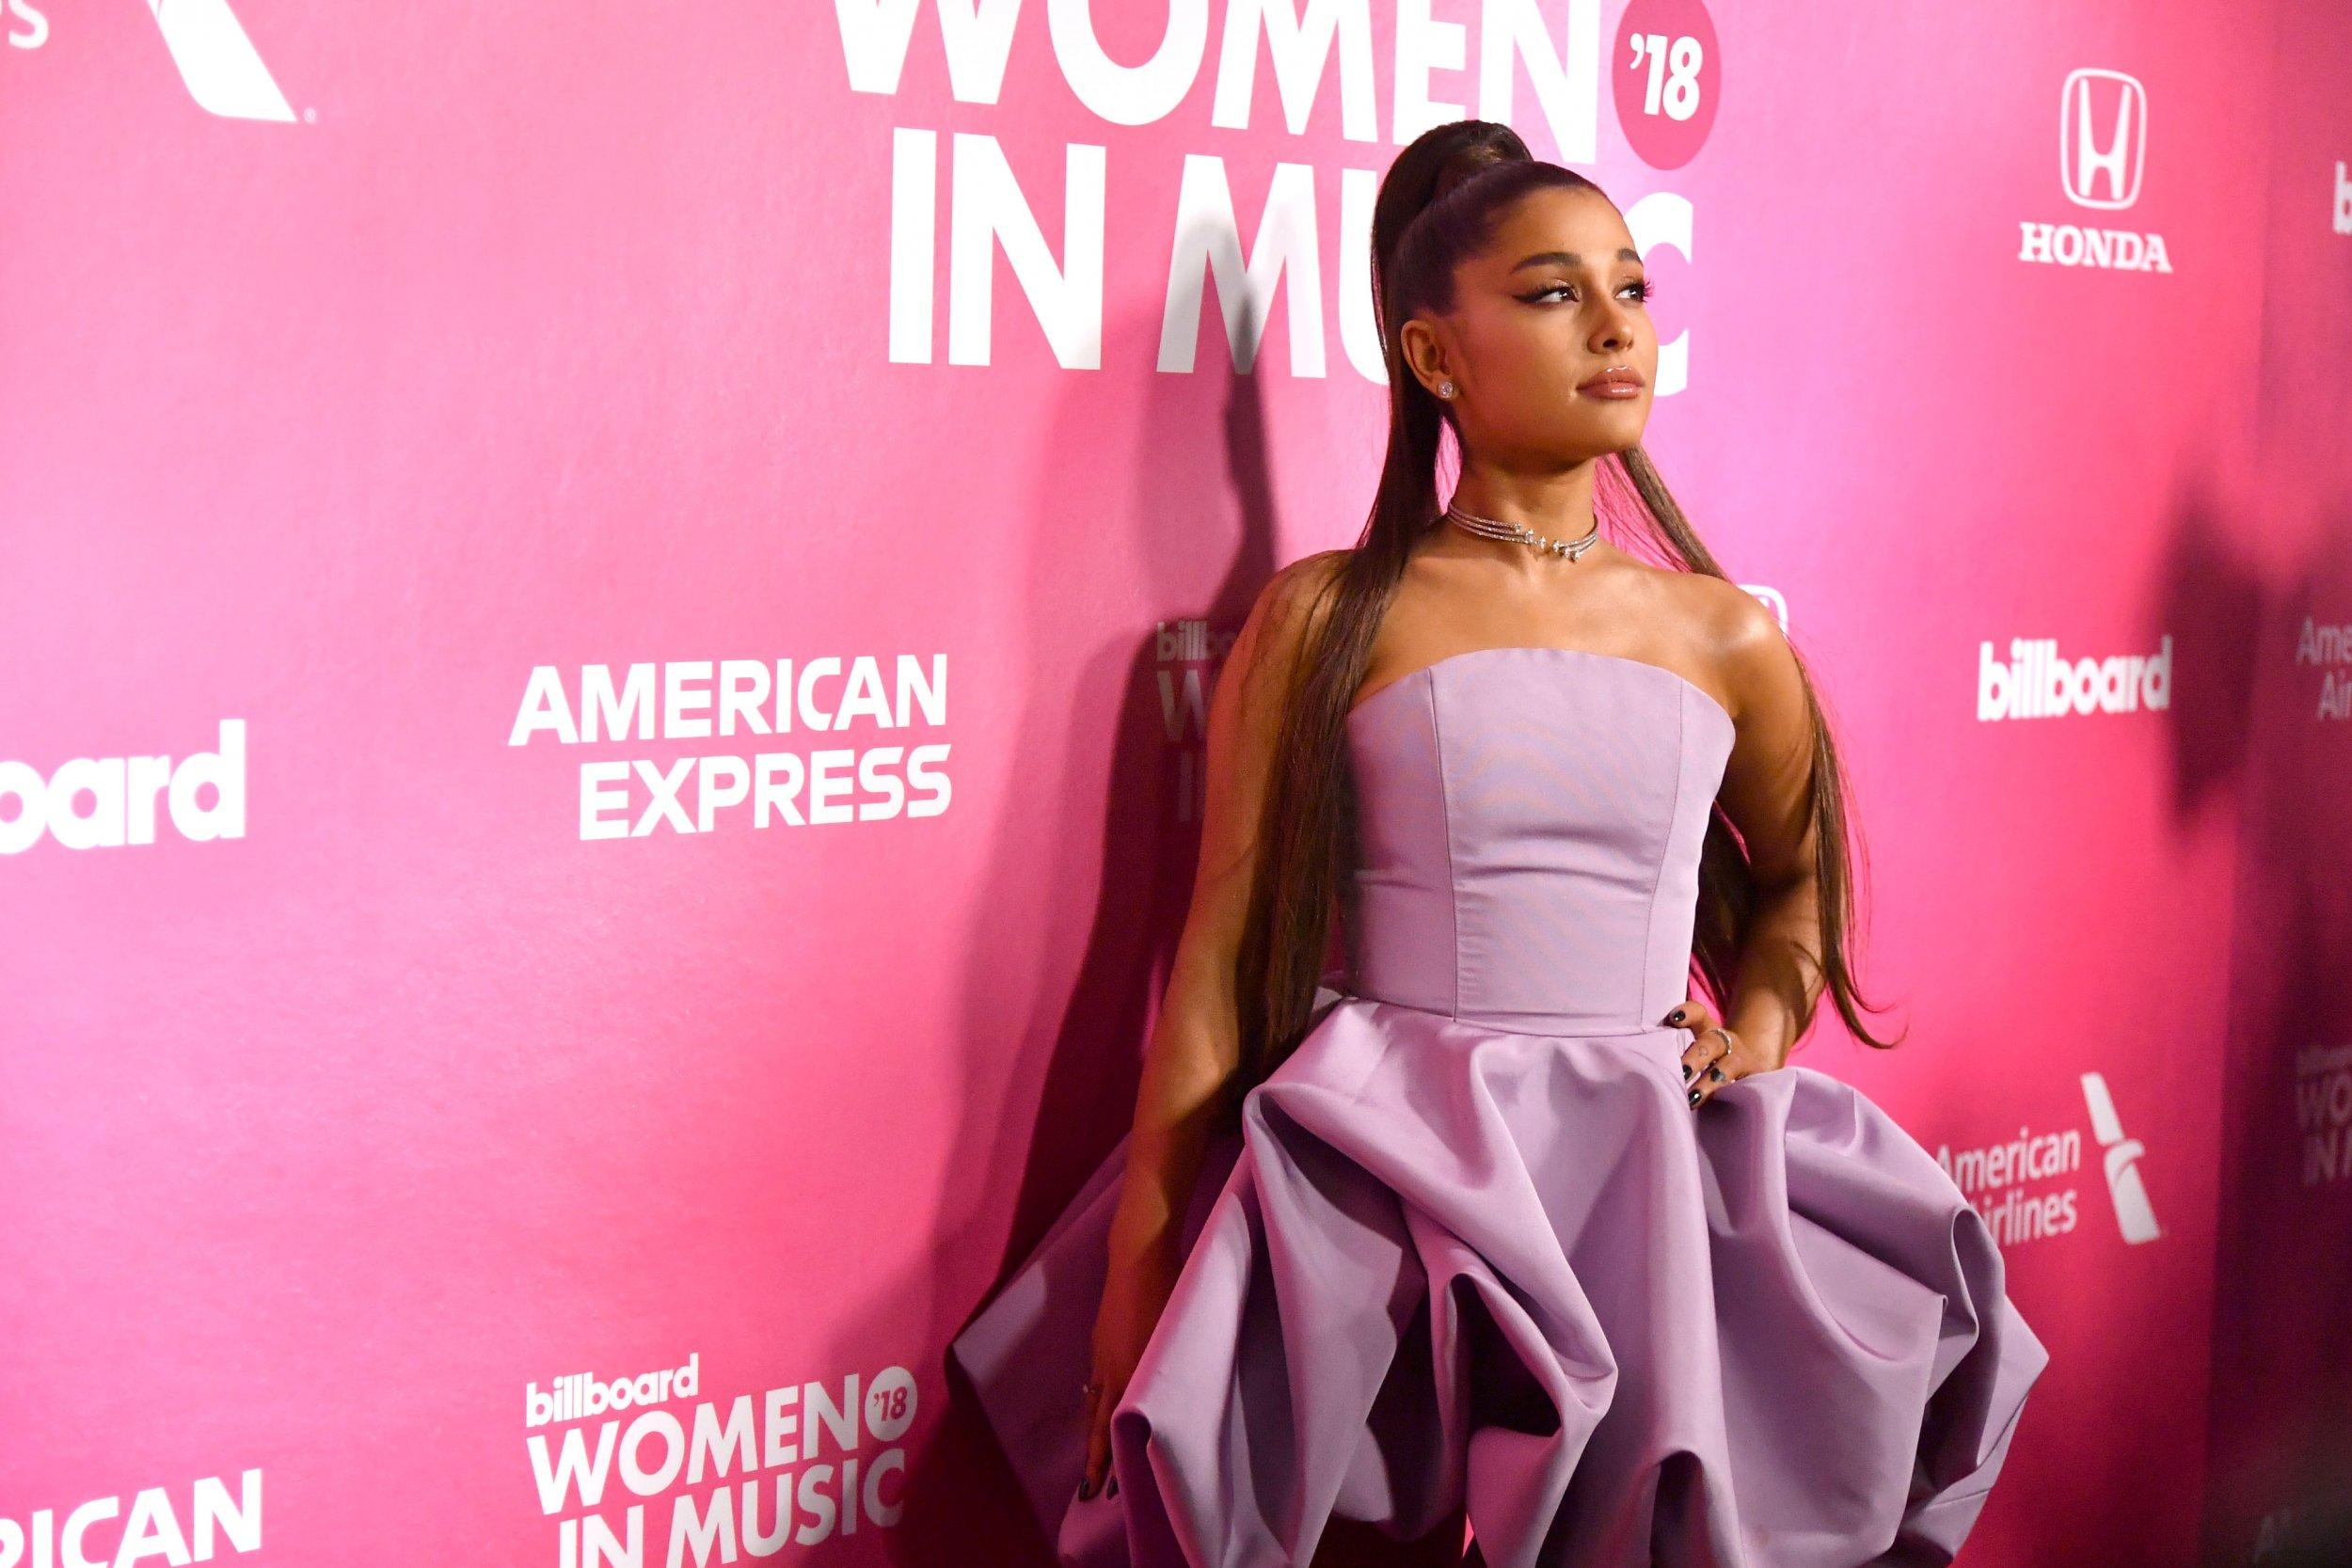 Ariana Grande 7 Rings Boycott